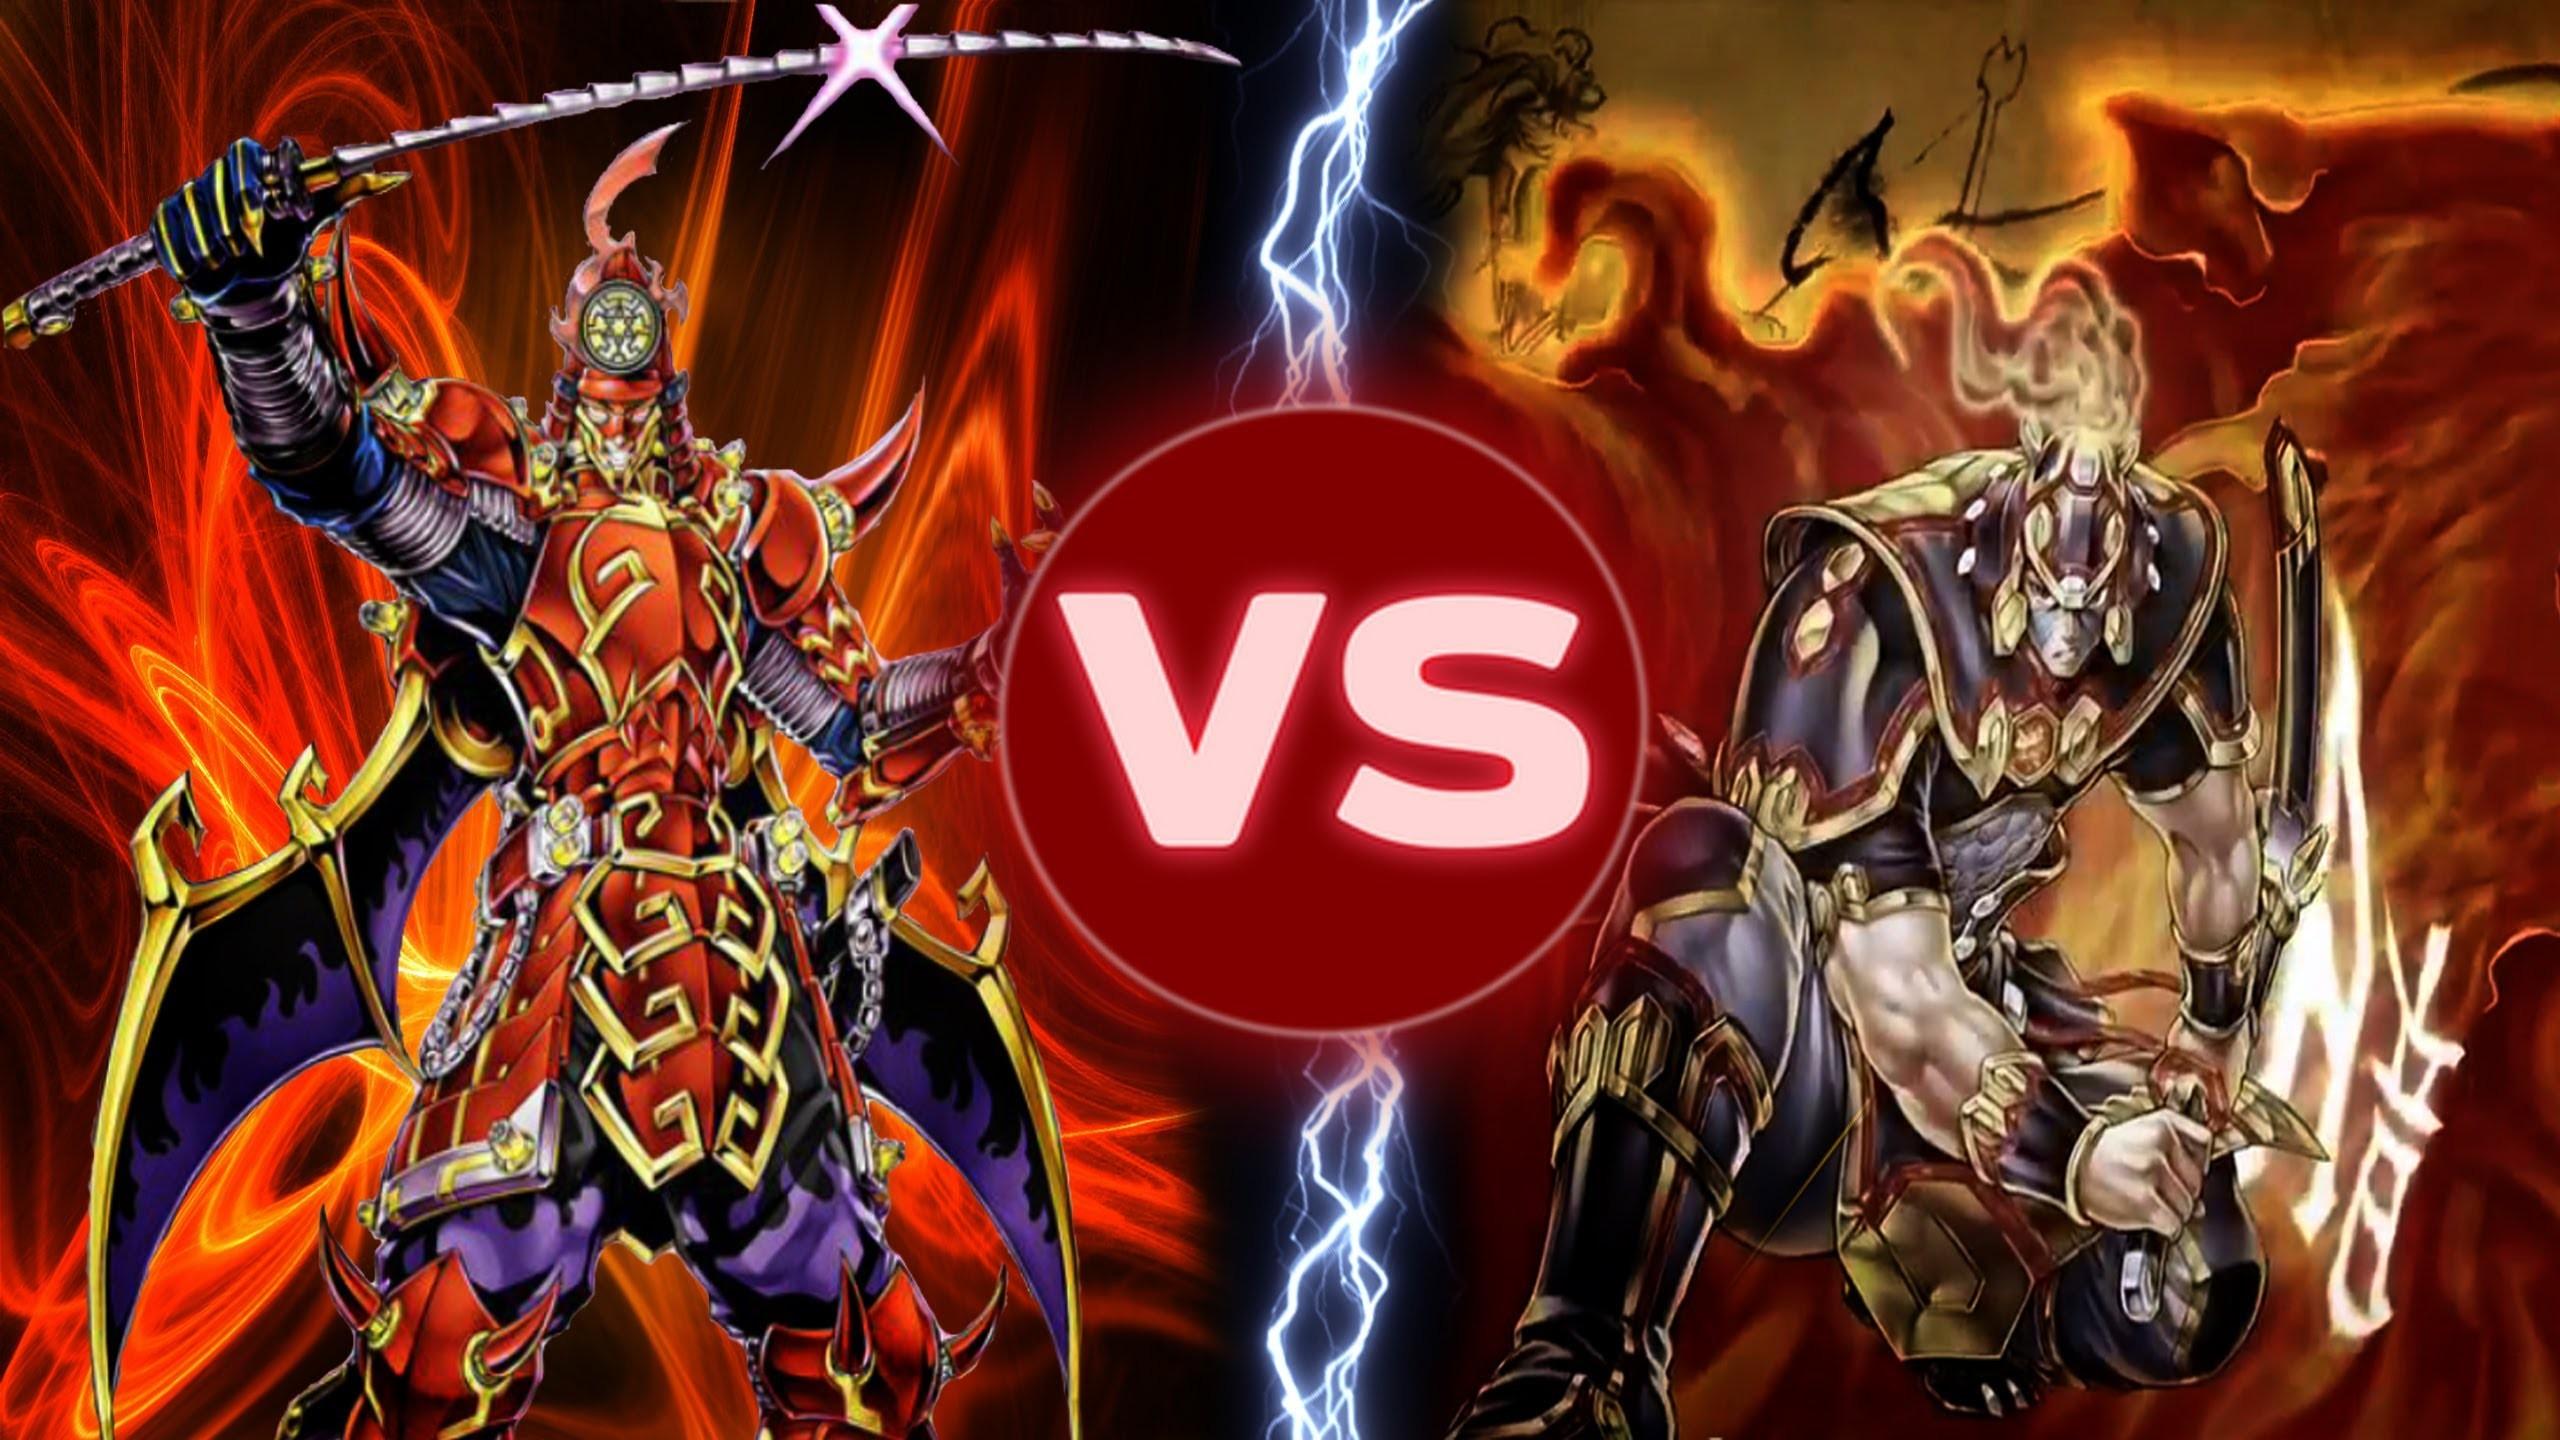 Yugioh Duel – Six Samurais Vs Fire Fist!! 2013! (Dueling Network) – YouTube